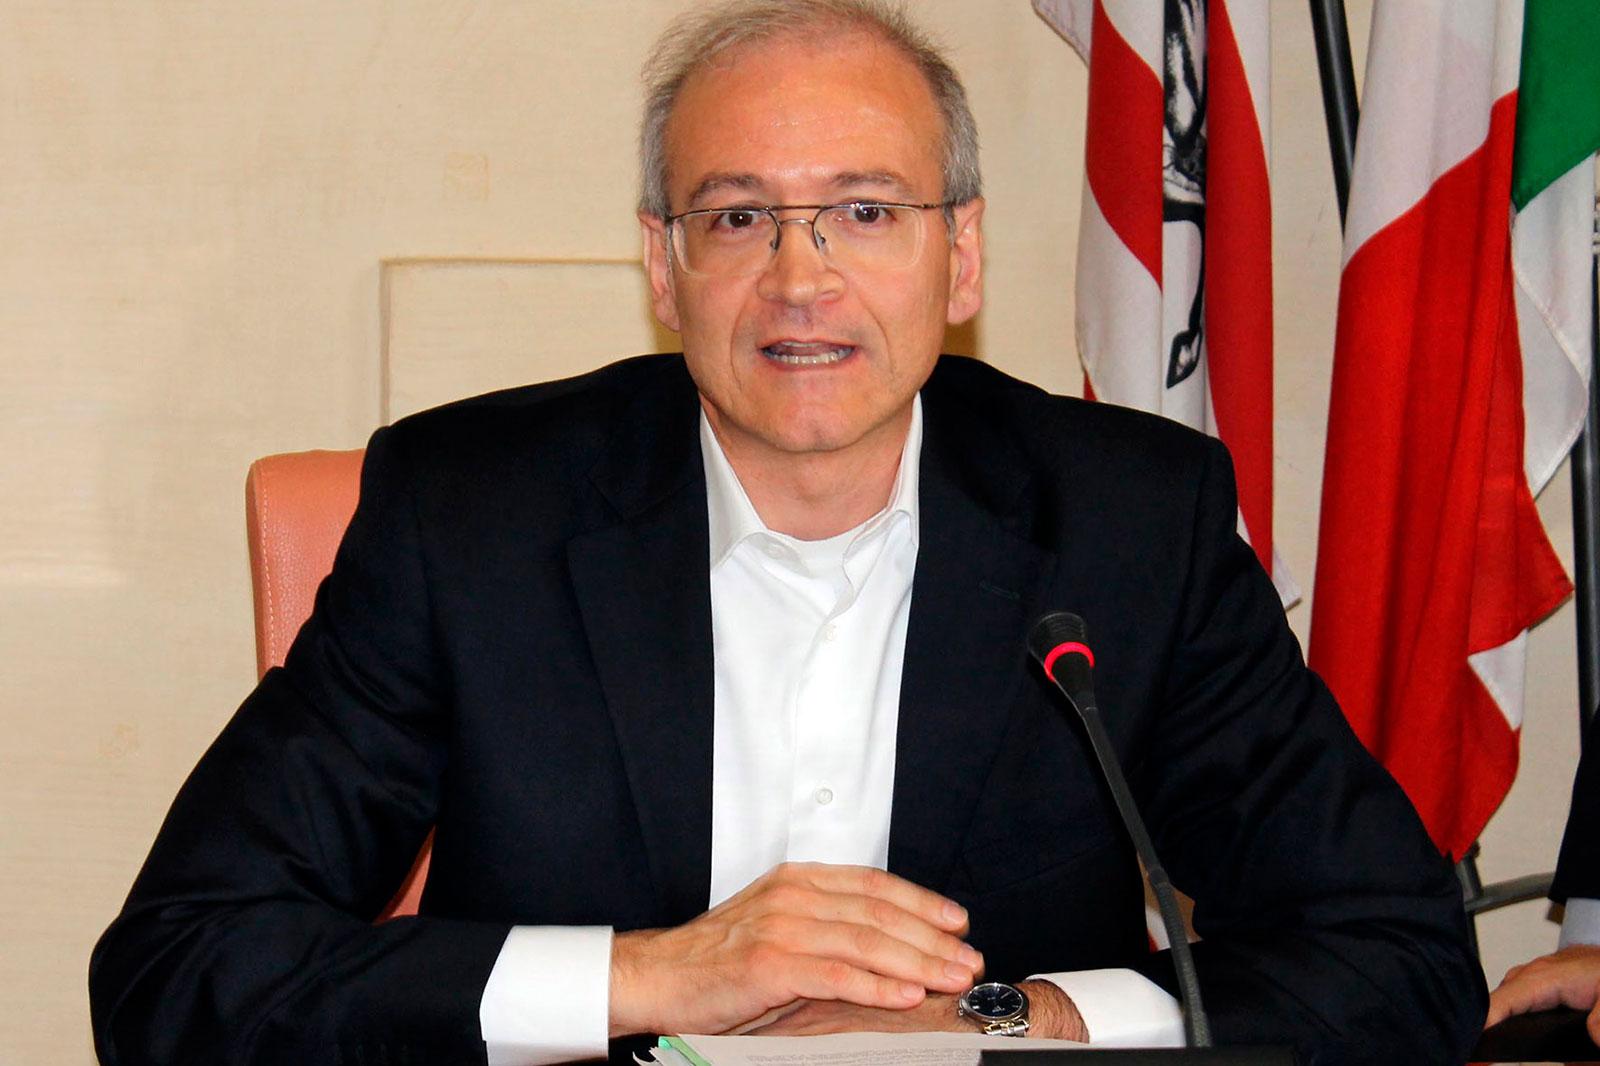 Luigi Scatizzi